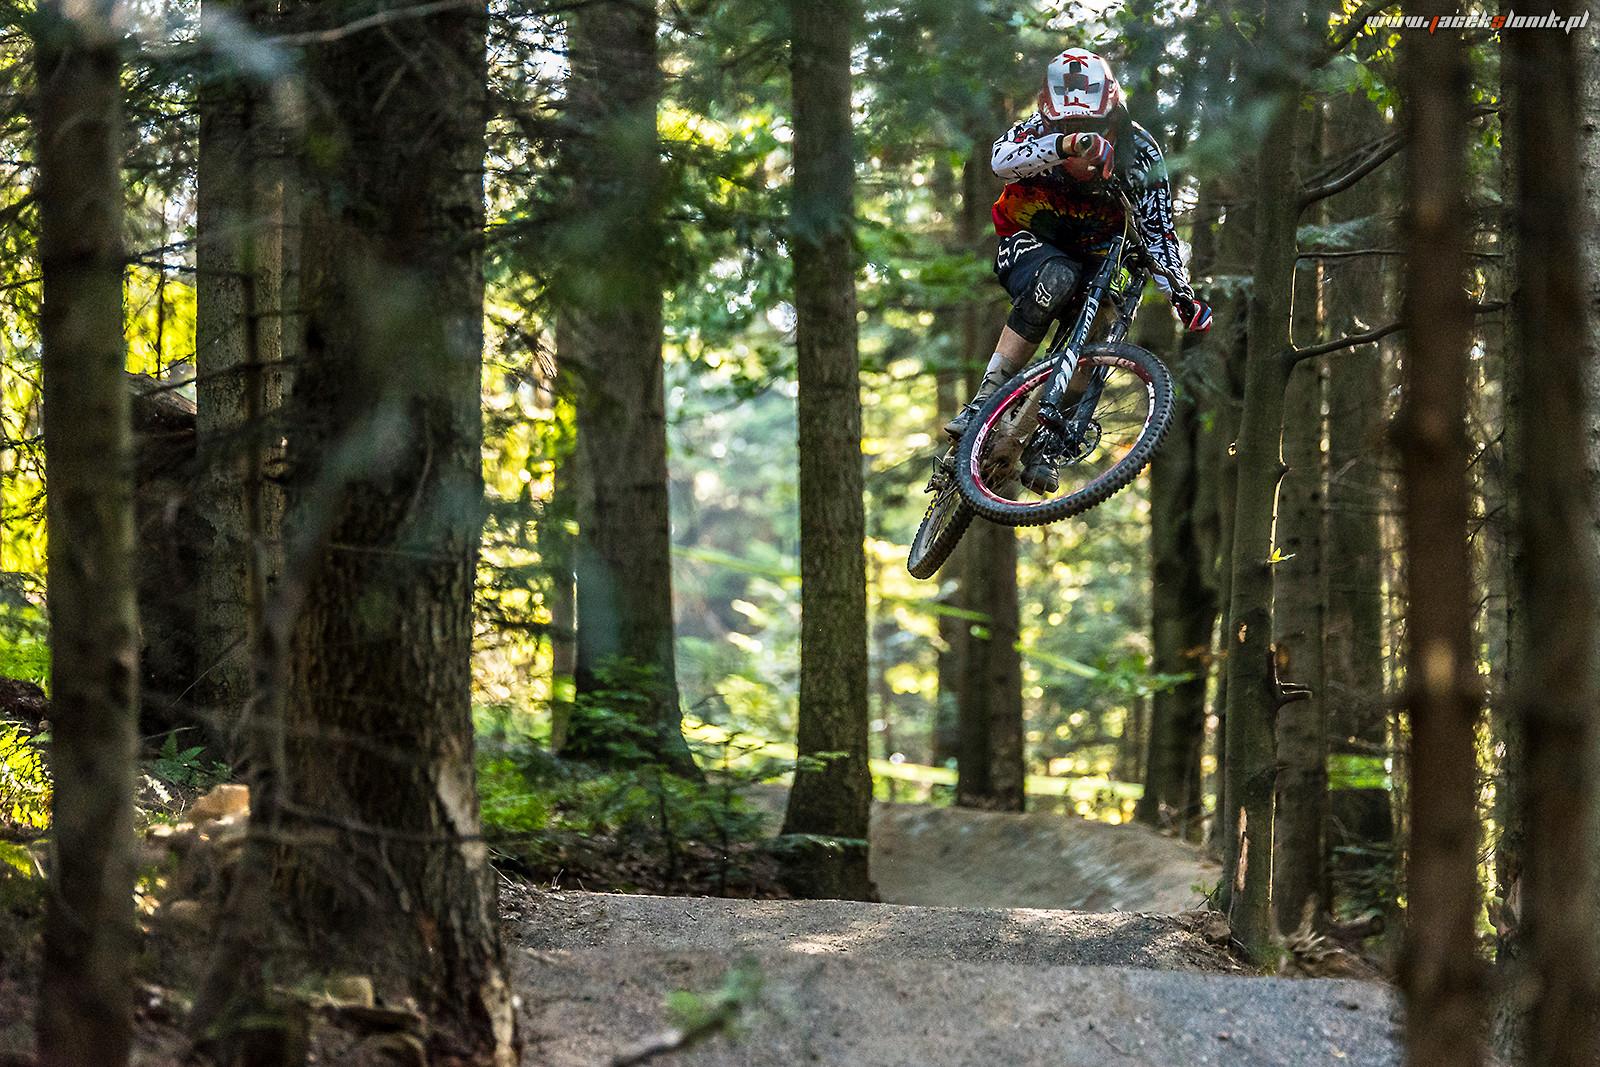 Tryin' to be stylish ... - JacekSlonik - Mountain Biking Pictures - Vital MTB